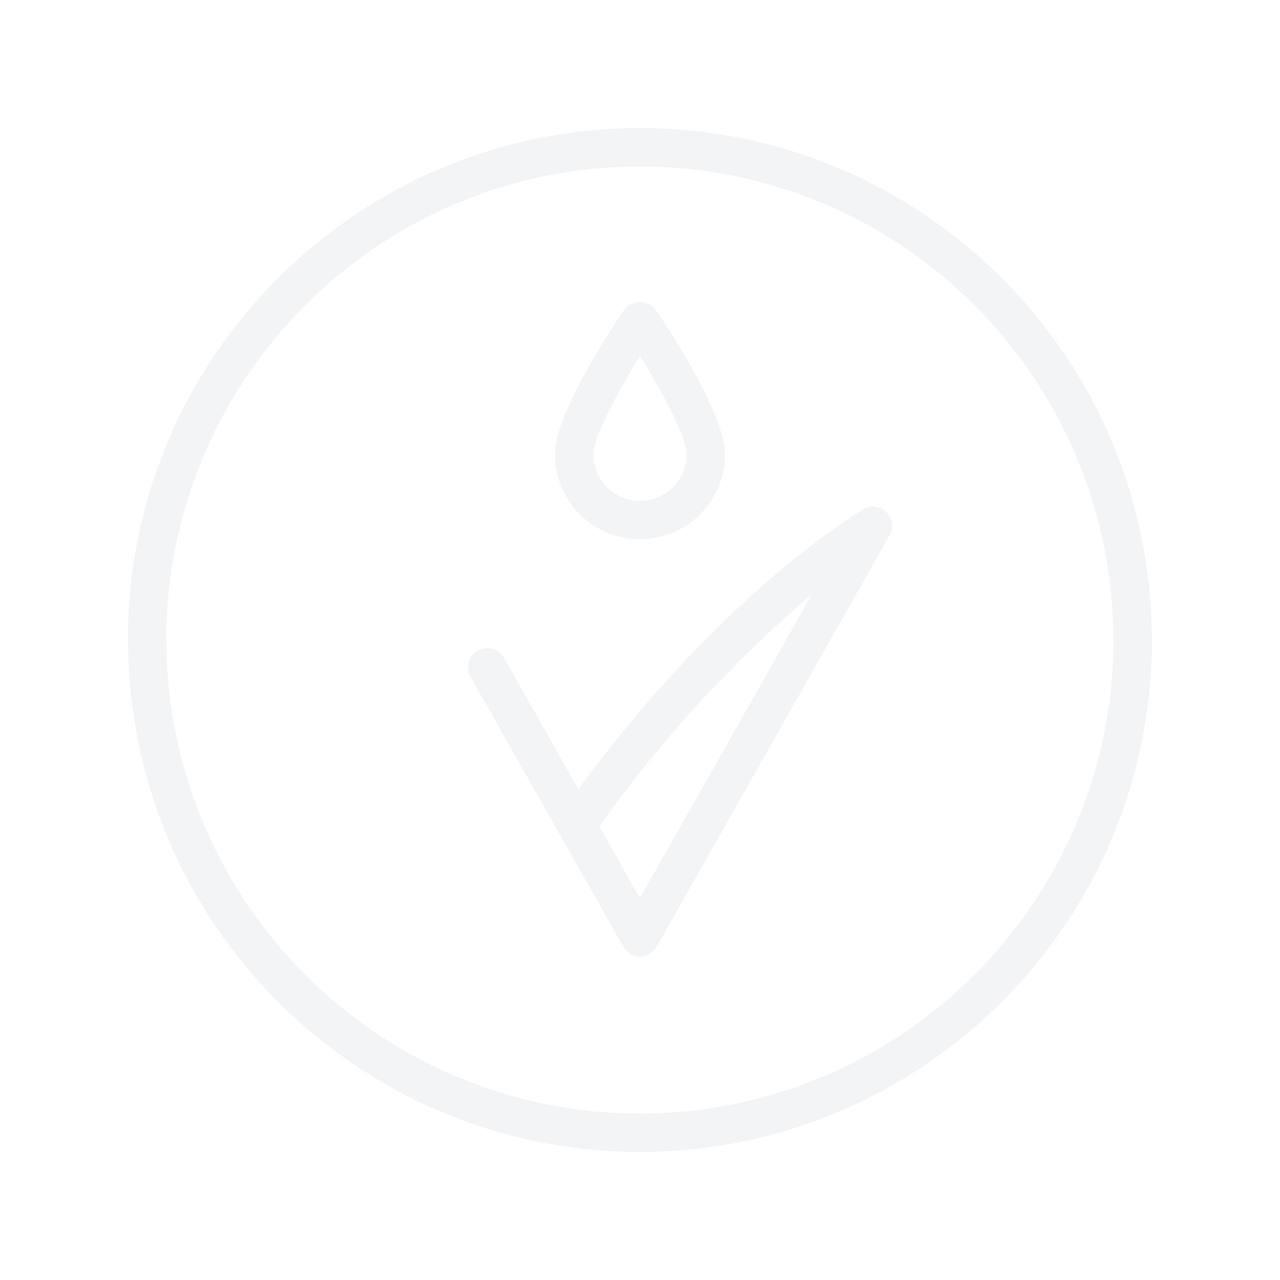 L'OREAL Color Riche Lipstick No.274 Ginger Chocolate помада для губ 3.6g